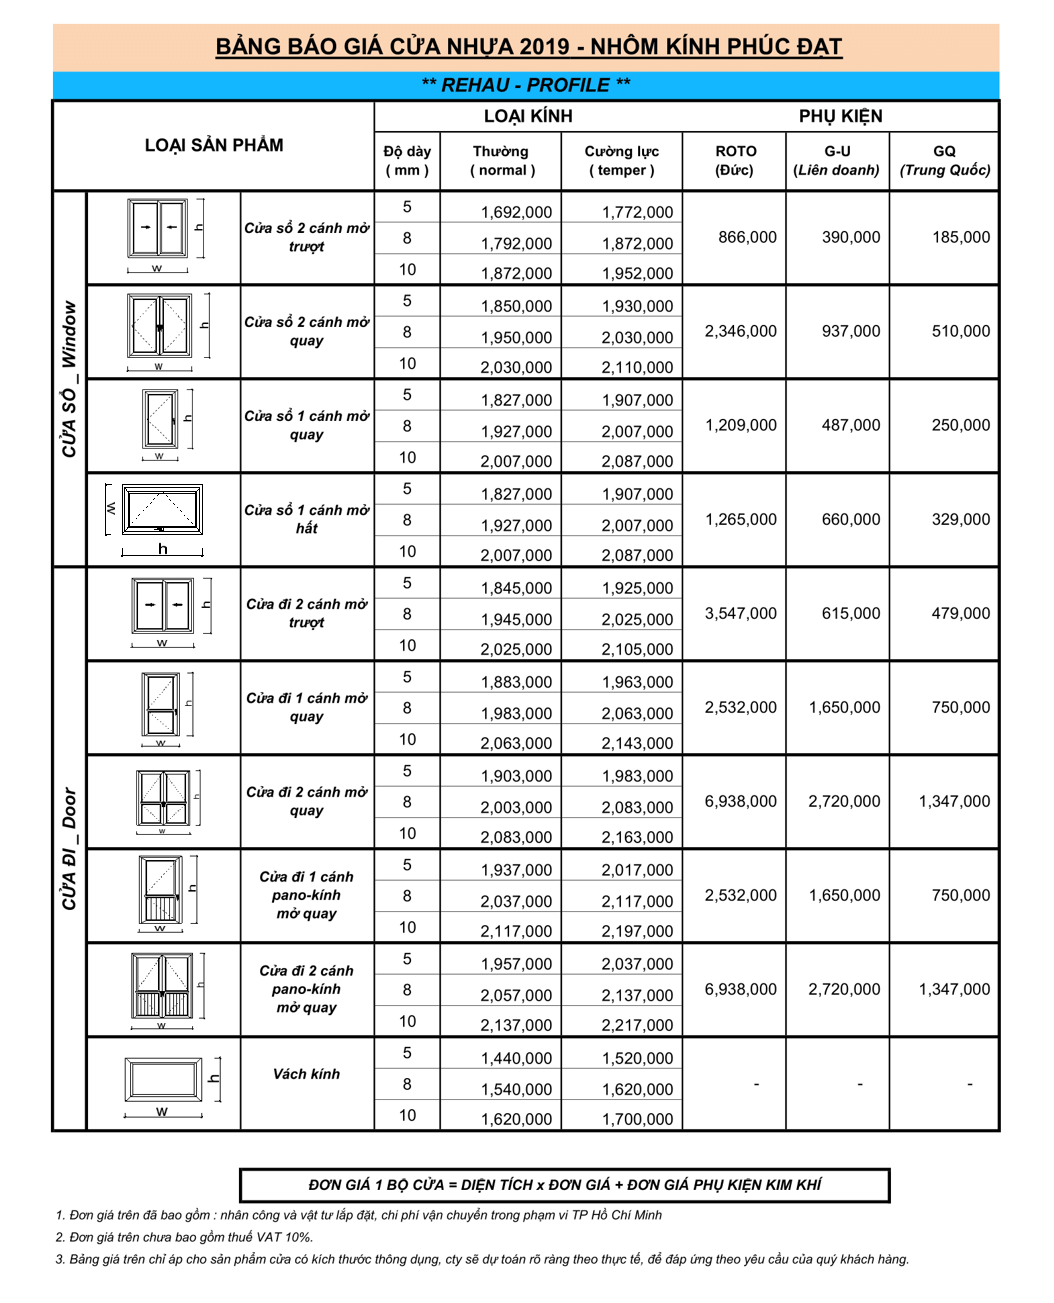 Bảng báo giá cửa nhựa lõi thép 2021 - Rehau Profile